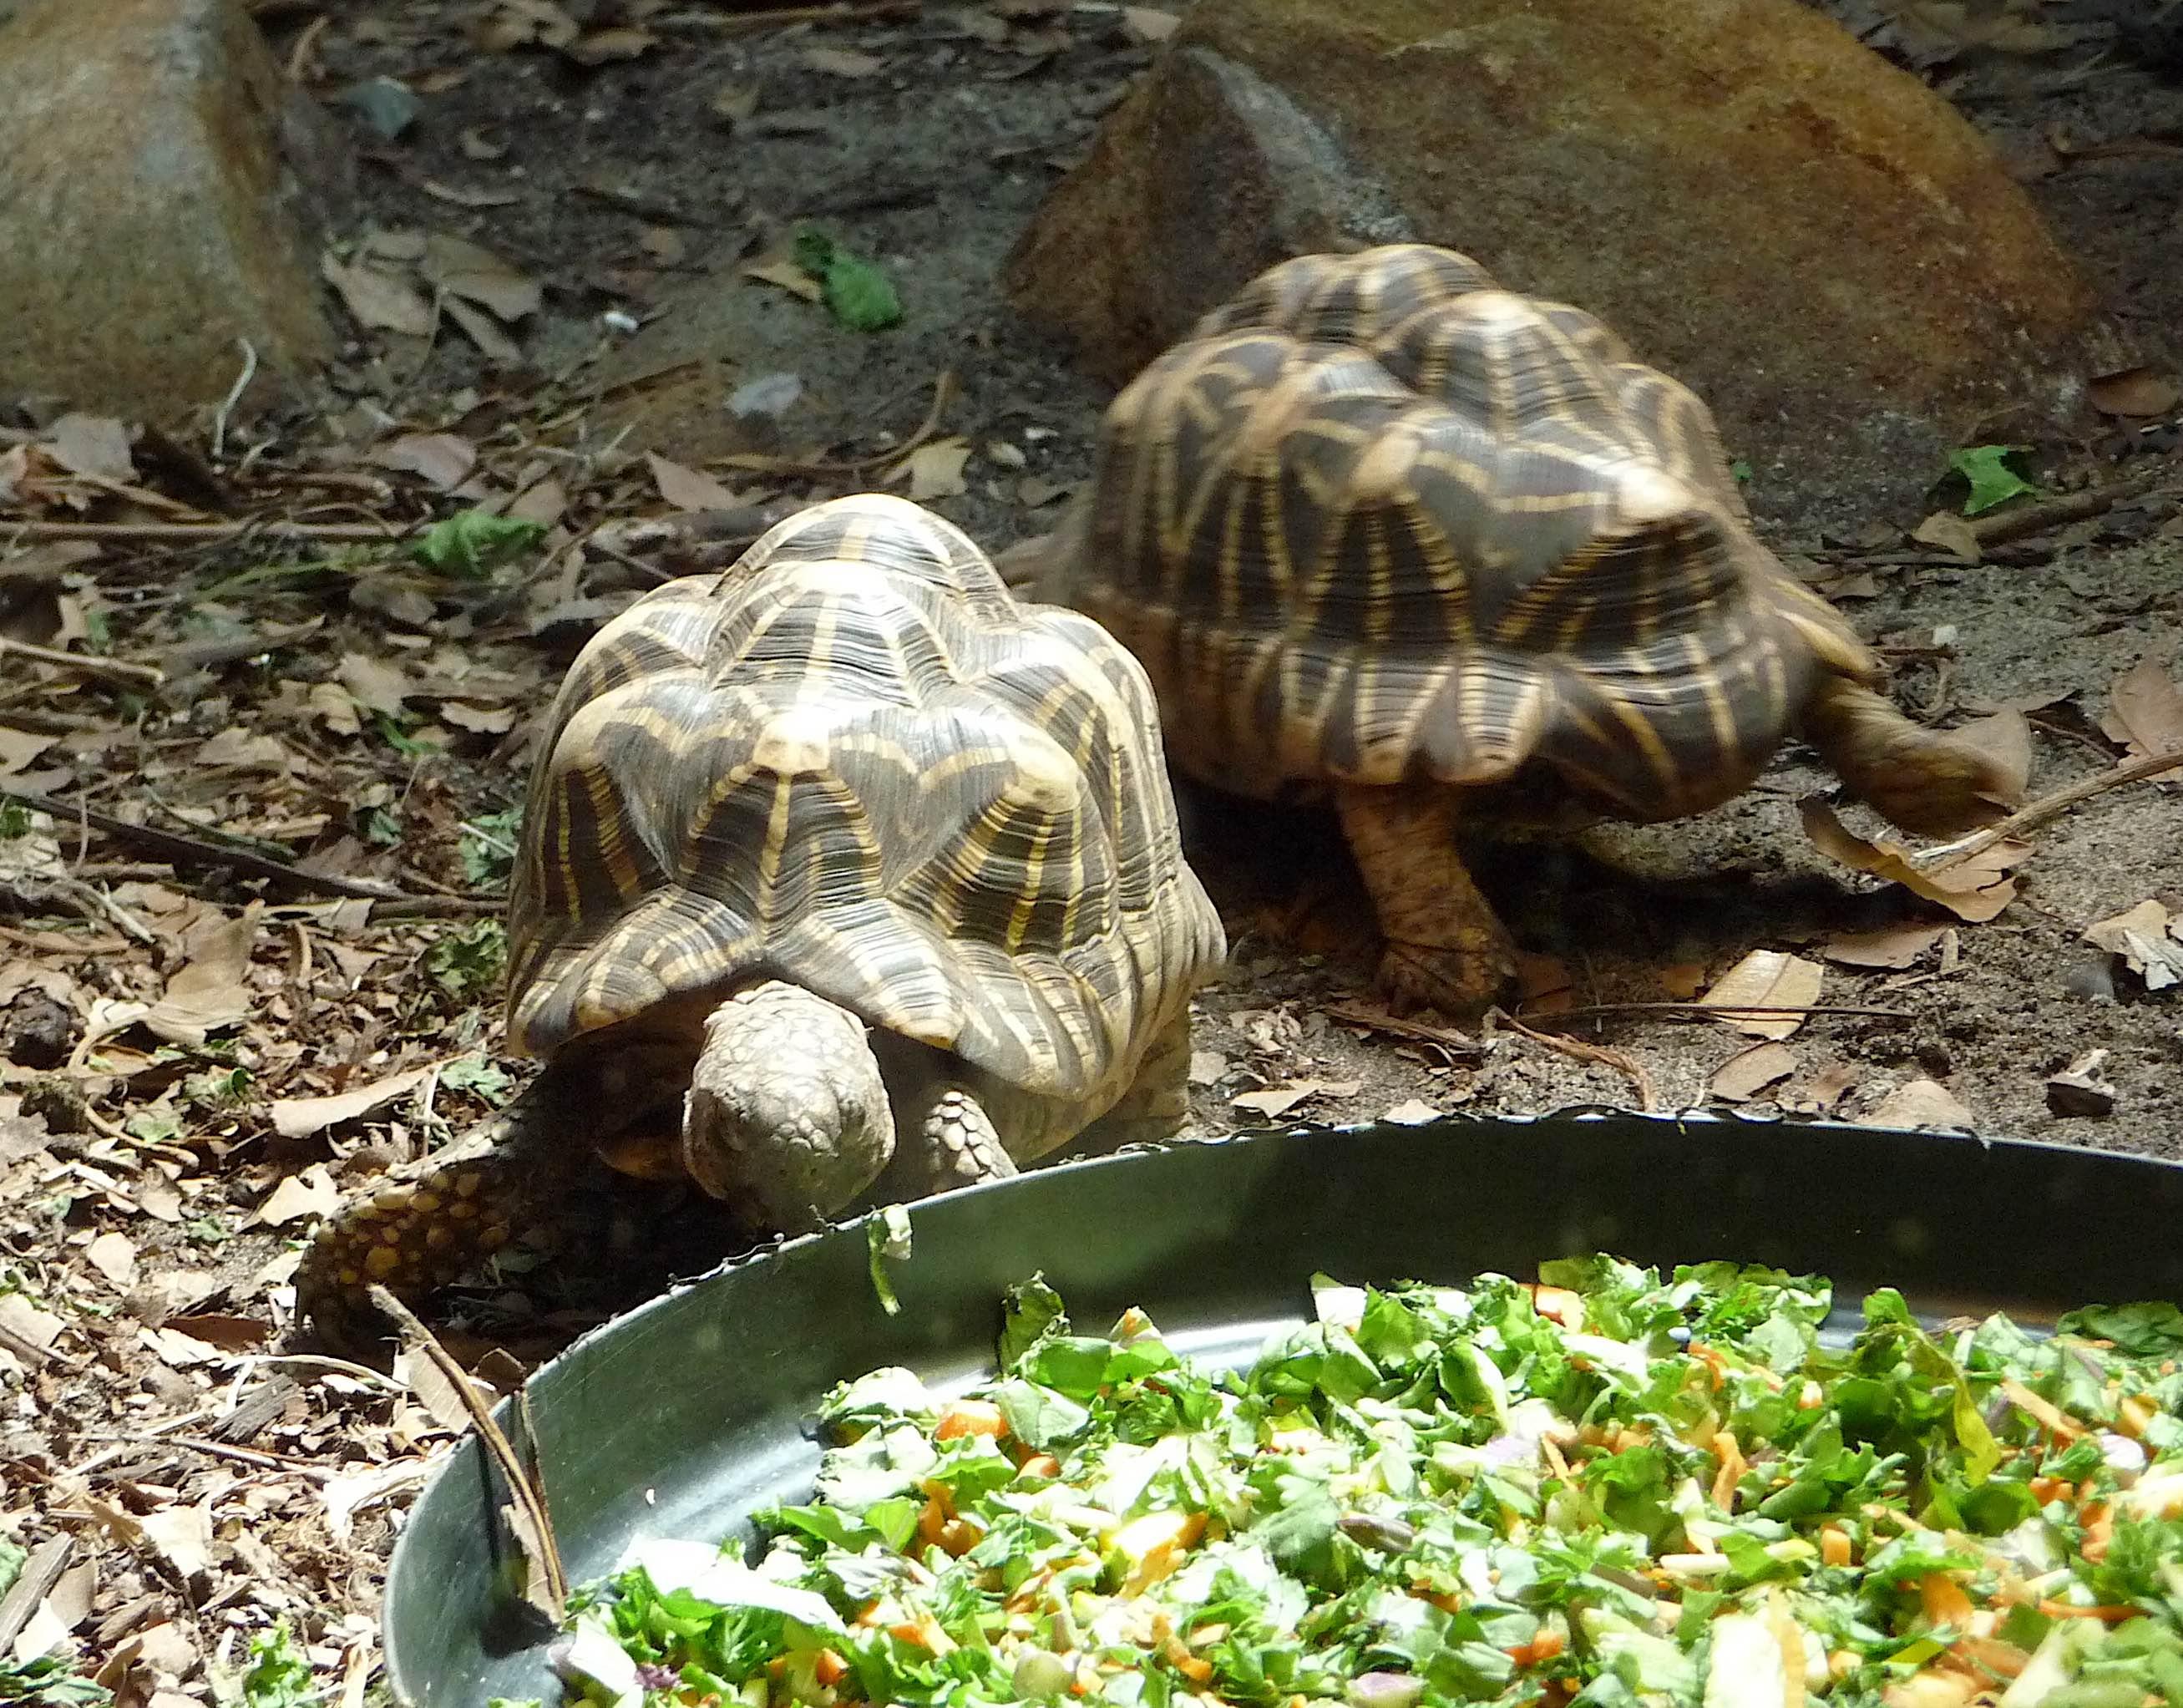 50.Indian star tortoise